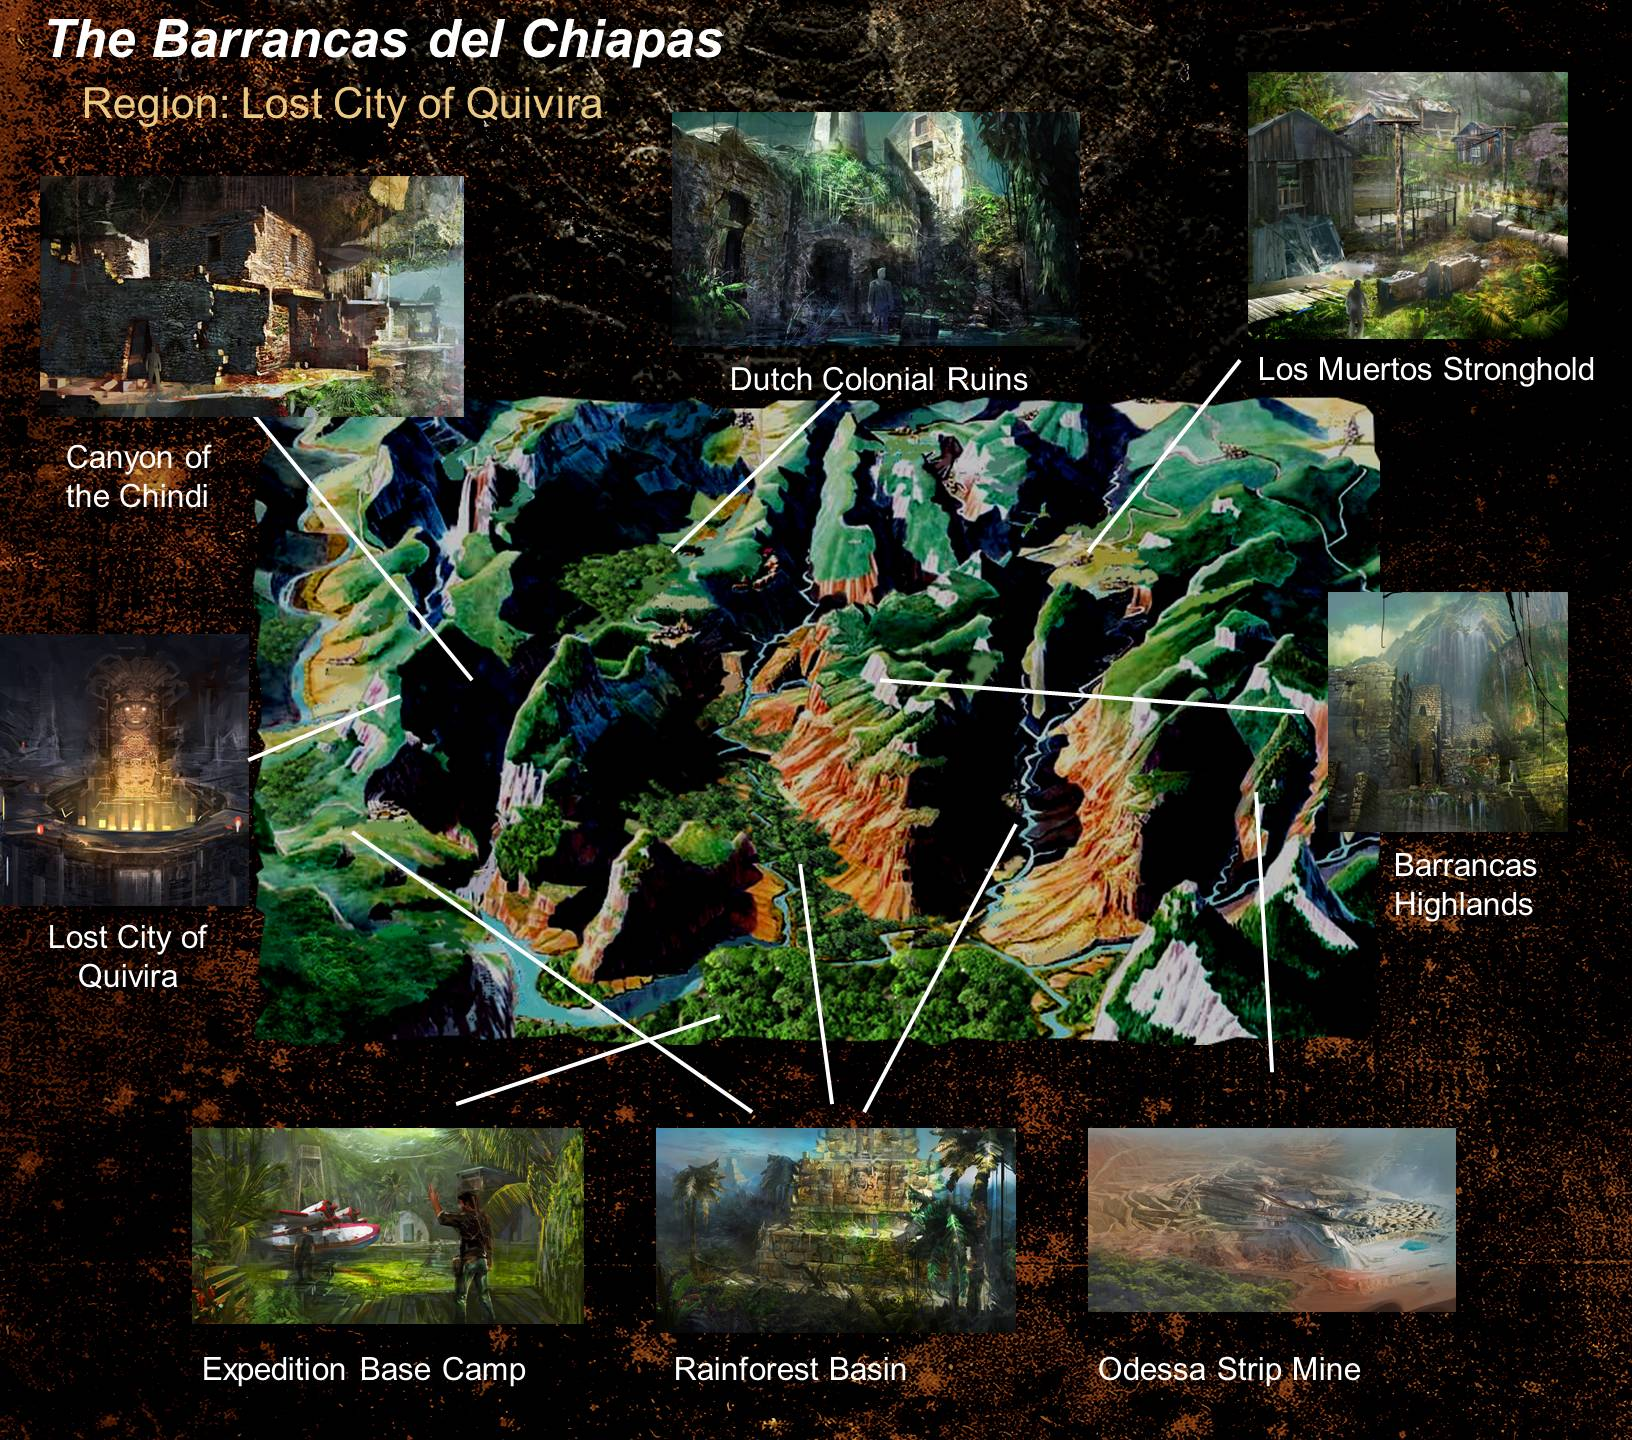 Uncharted-GoldenAbyss PS Vita Div 004